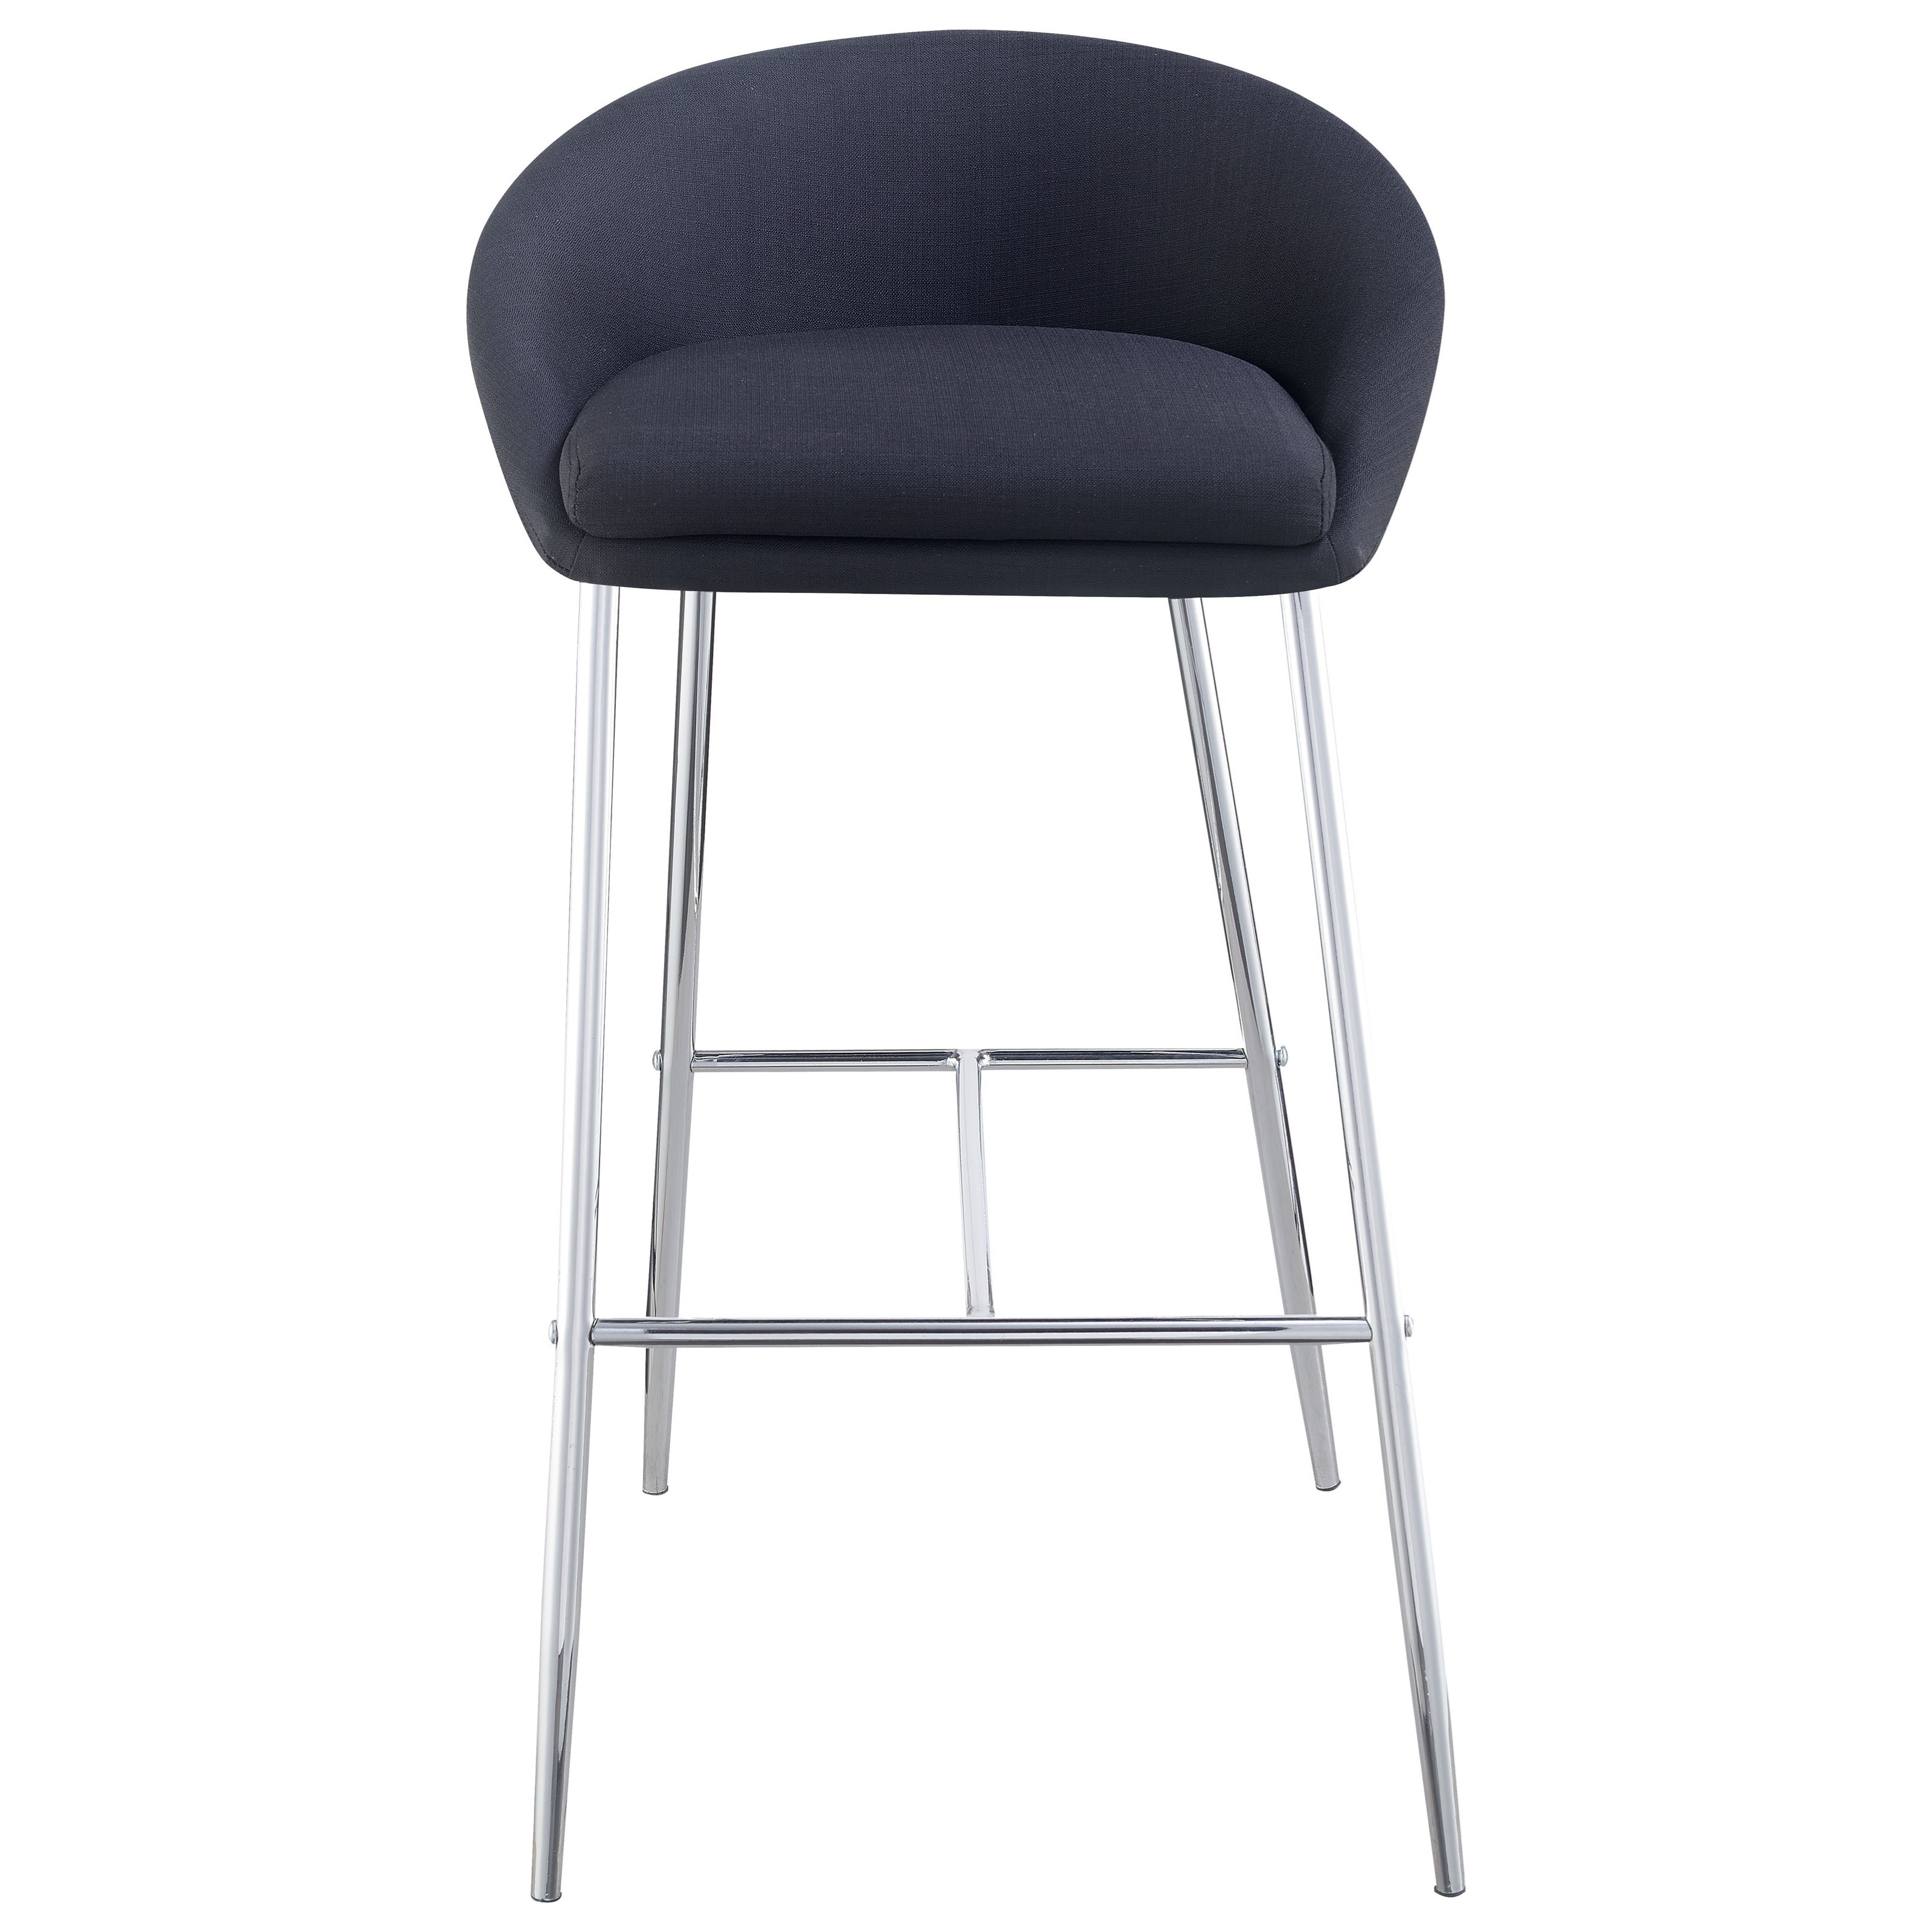 Coaster Dining Chairs and Bar Stools Contemporary Bar  : products2Fcoaster2Fcolor2Fdining20chairs20and20bar20stools102526 b1 from www.valuecitynj.com size 3200 x 3200 jpeg 717kB